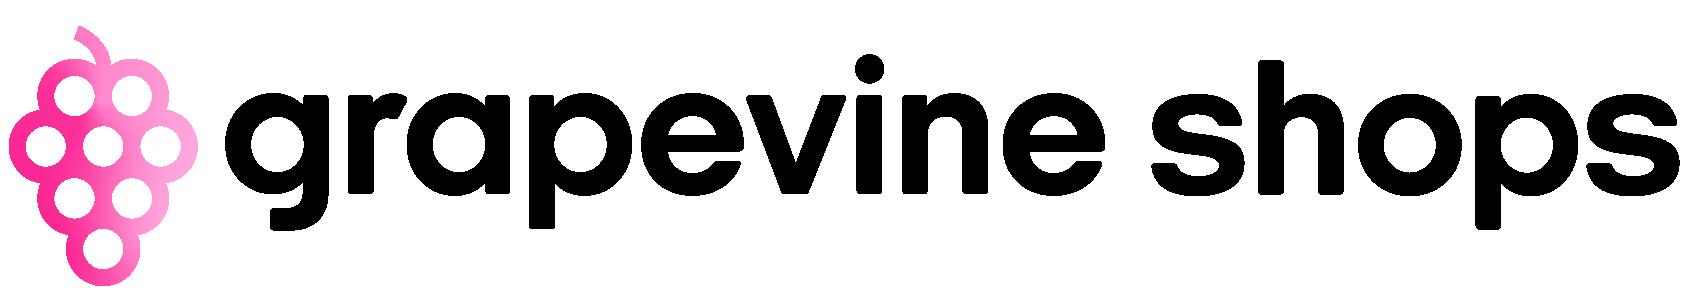 Grapevine Shops_Logo-01